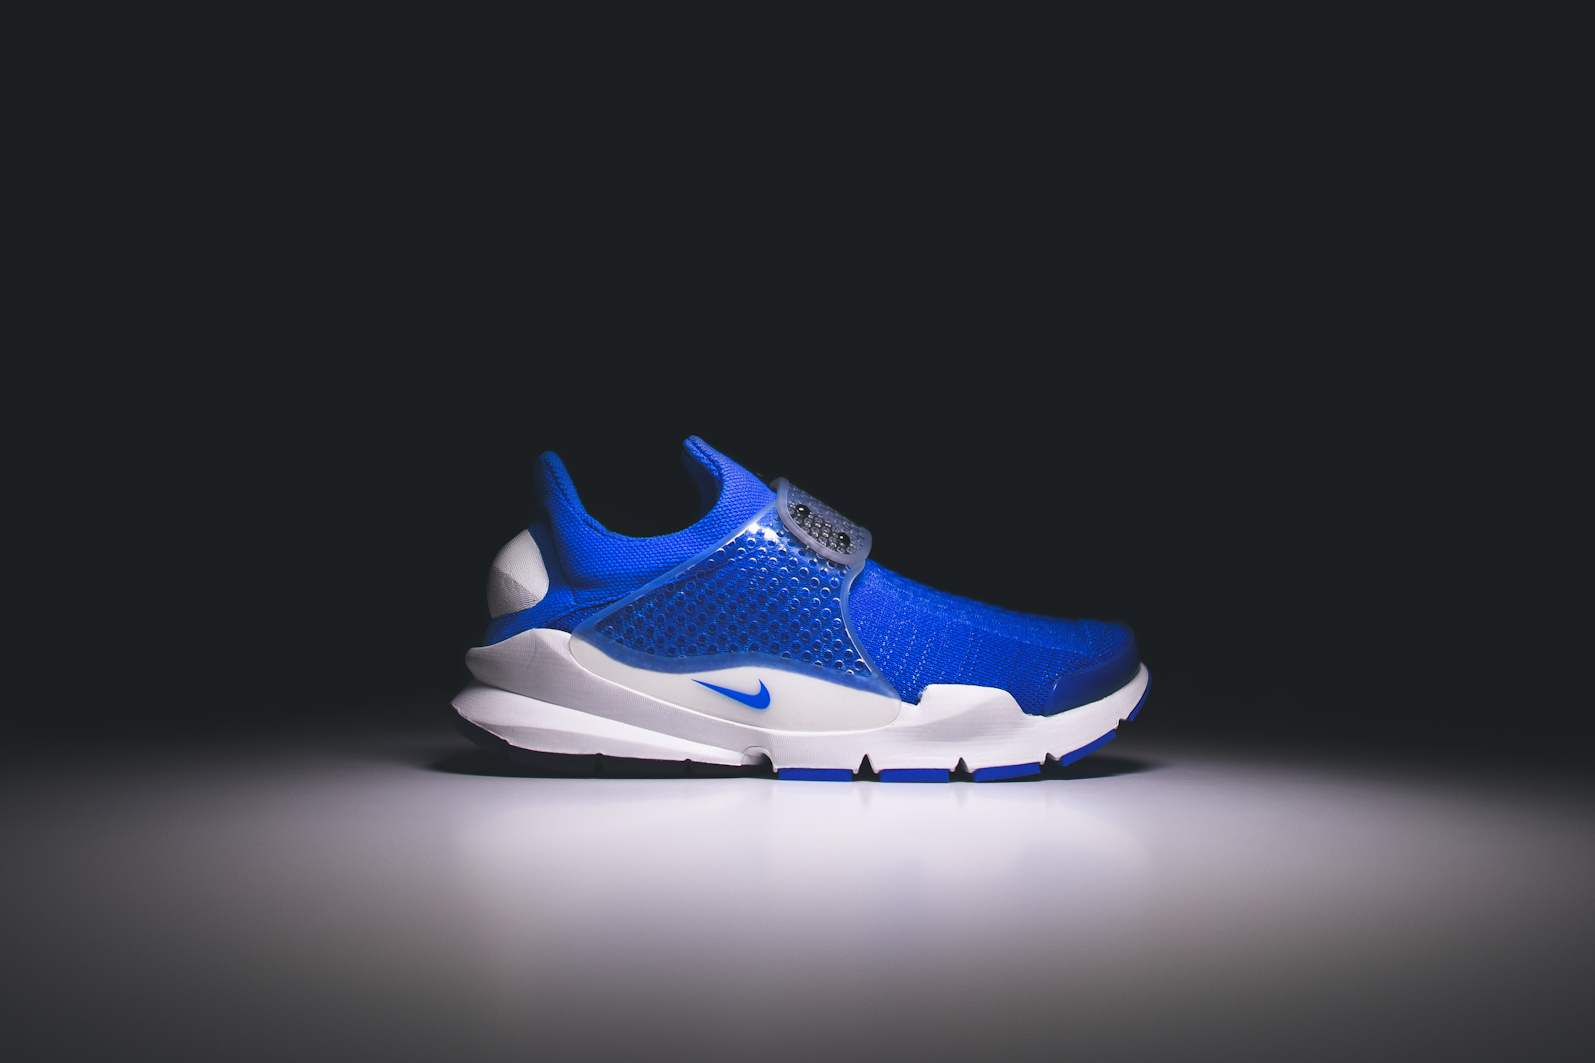 best website bc366 f0321 Fragment Design x Nike Sock Dart SP - Photo Blue